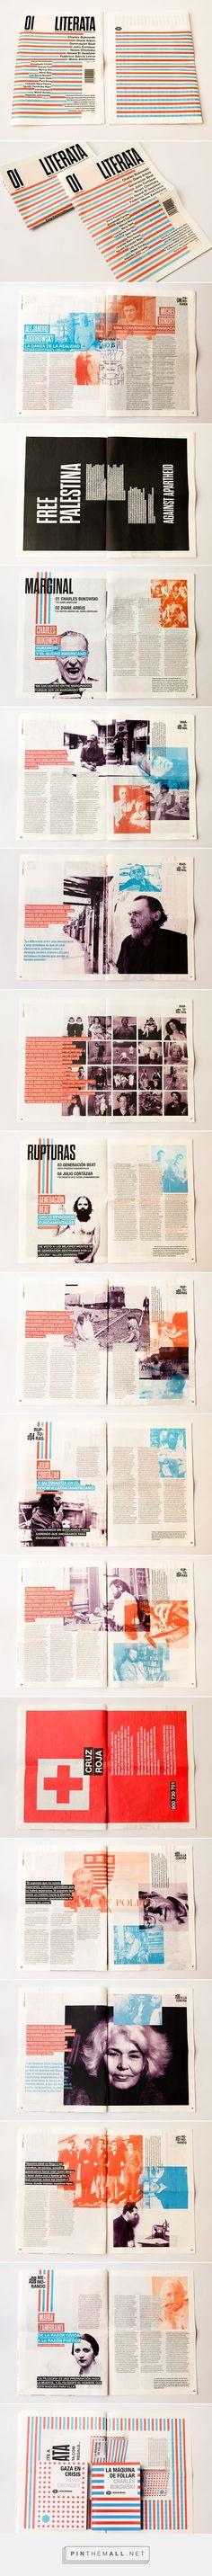 Literata Proyecto de estudiante.  Zhamora is a graphic designer freelance based in Granada specialized in branding projects, graphic design, editorial and more.